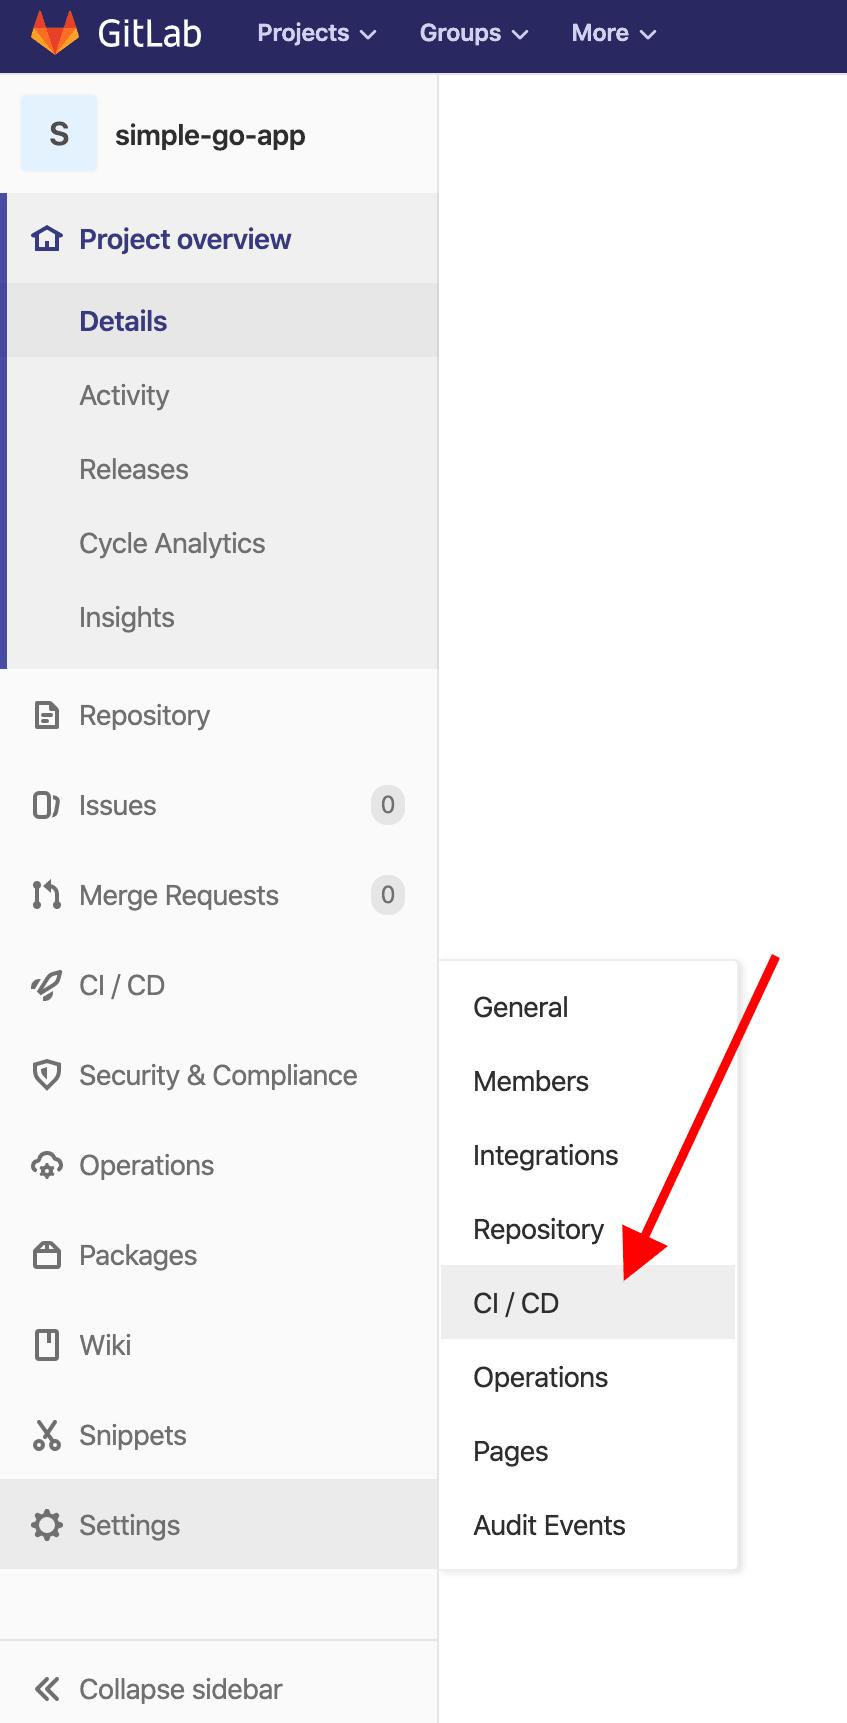 Gitlab CI/CD menu option